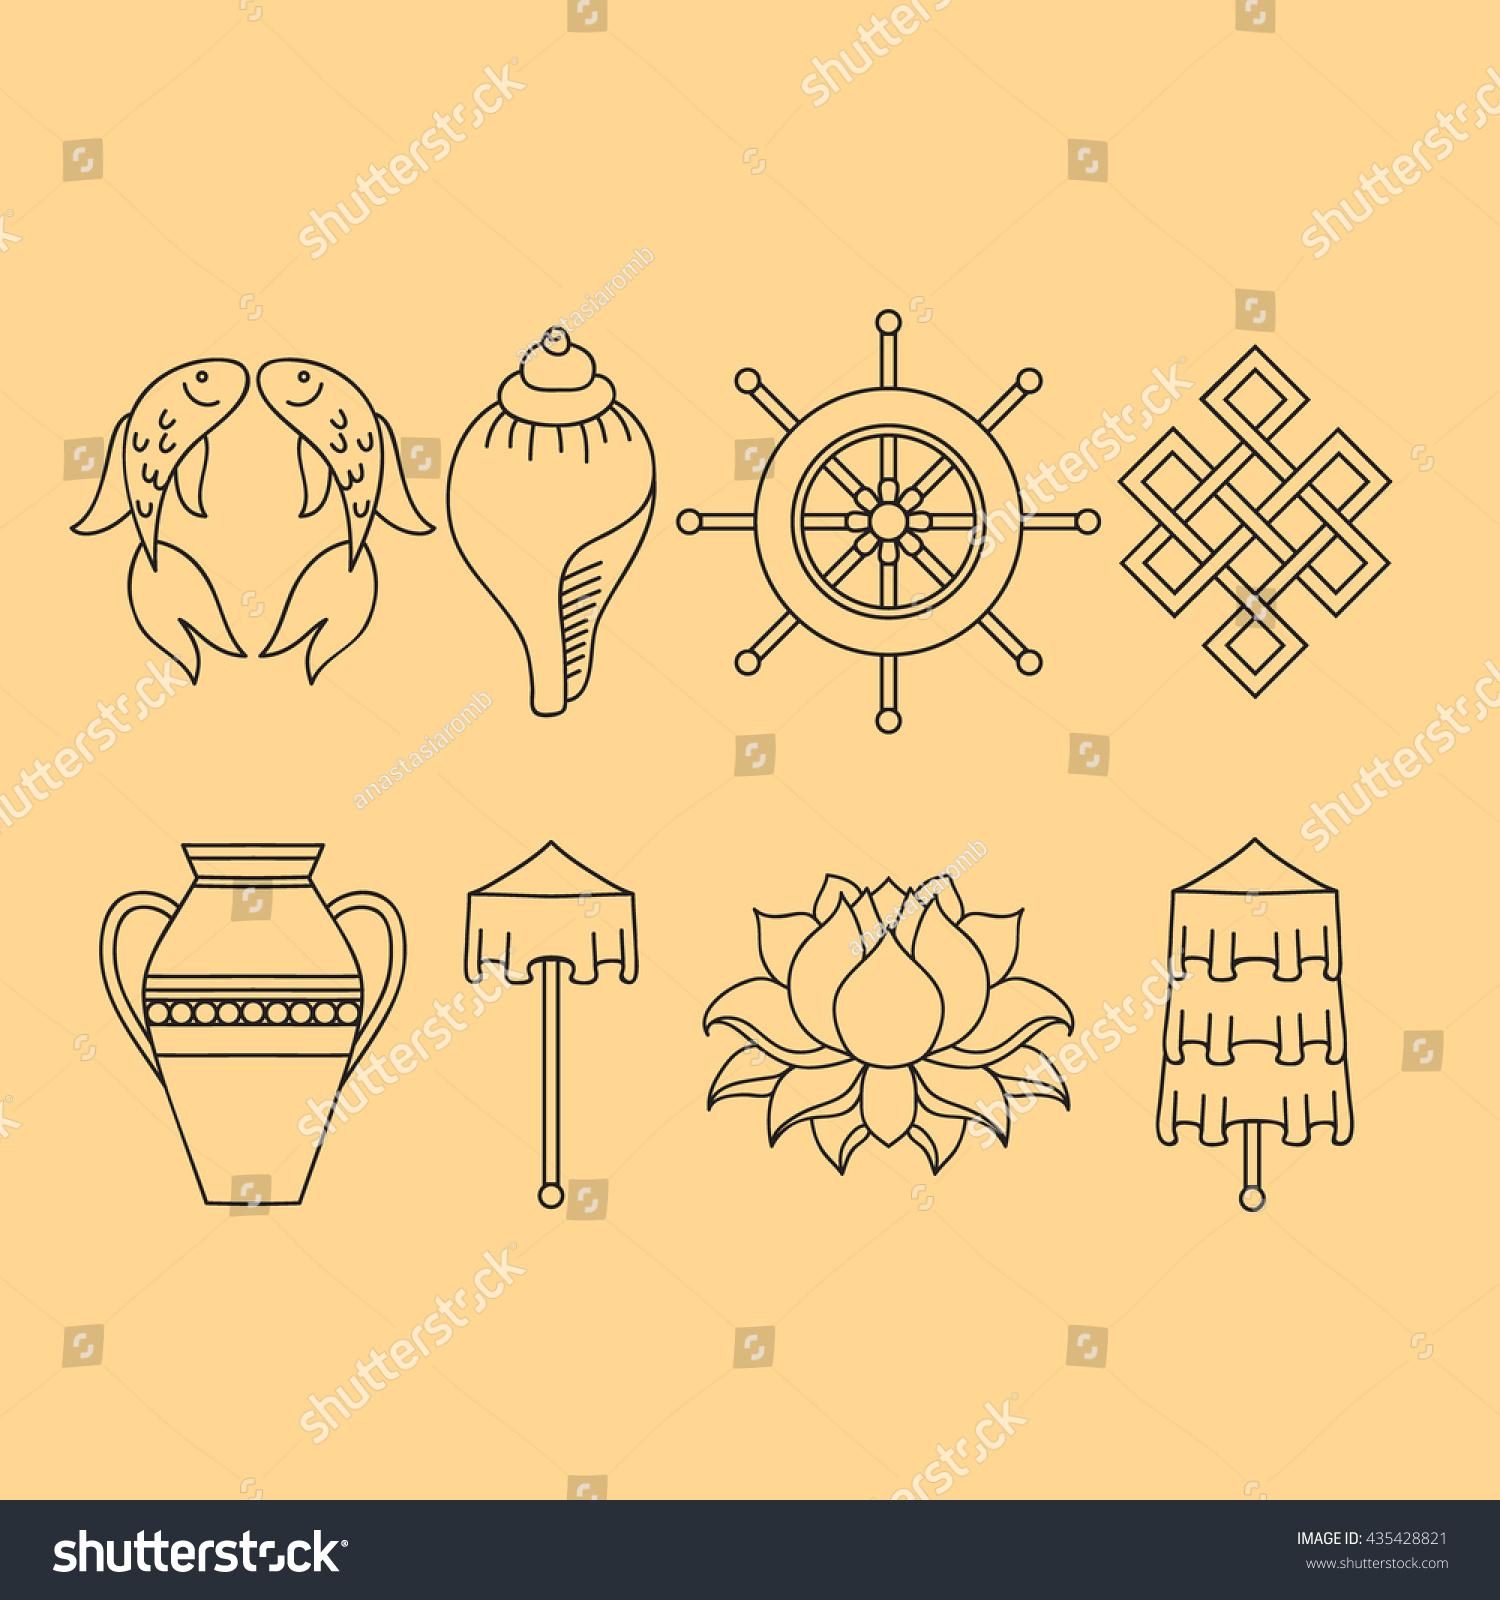 Buddhist symbolism 8 auspicious symbols buddhism stock vector buddhist symbolism the 8 auspicious symbols of buddhism right coiled white conch biocorpaavc Choice Image